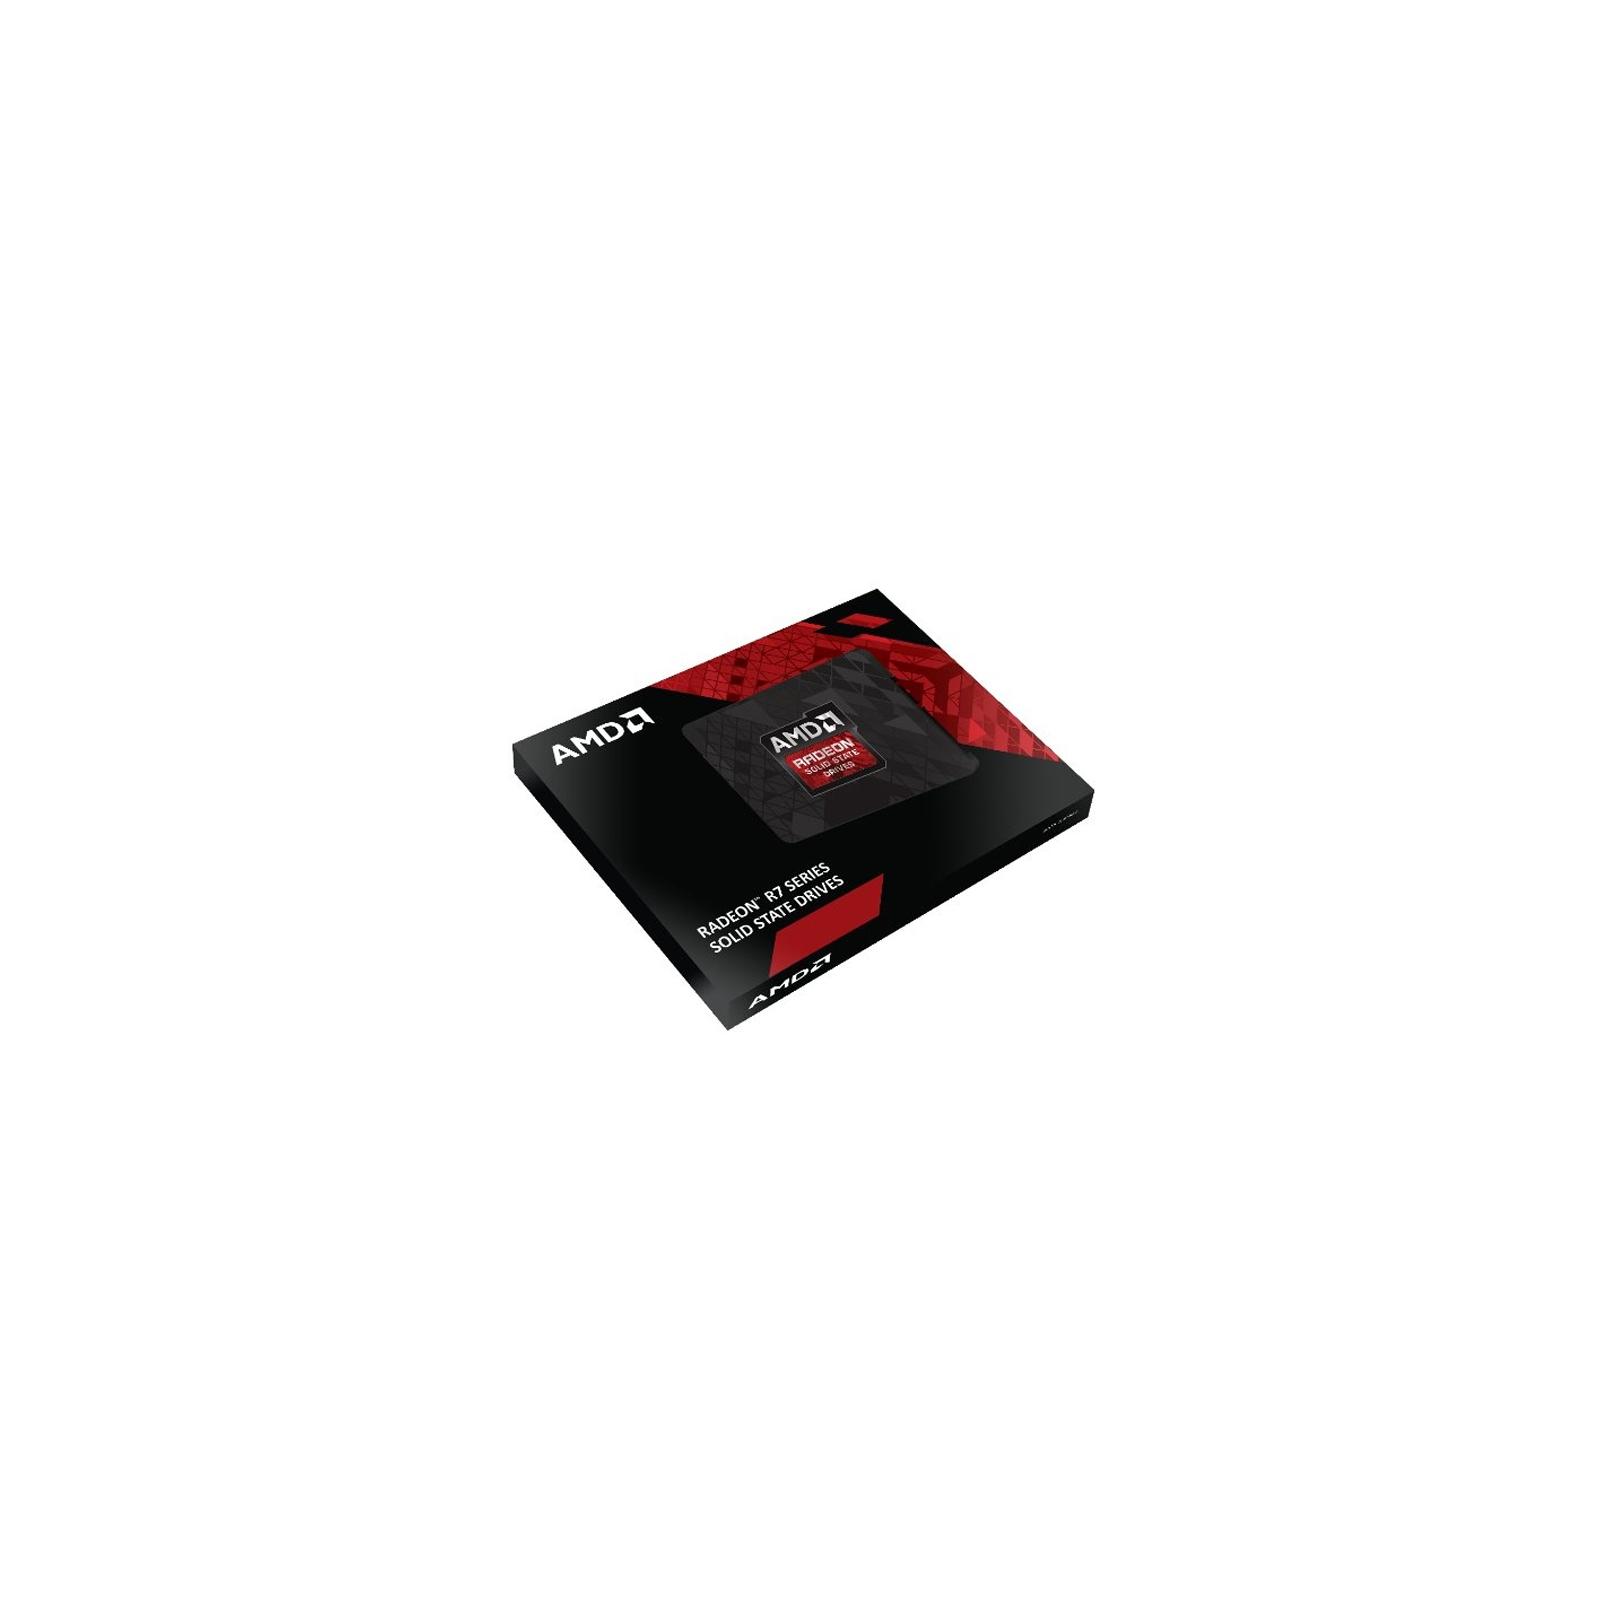 "Накопитель SSD 2.5"" 960GB AMD (R3SL960G) изображение 5"